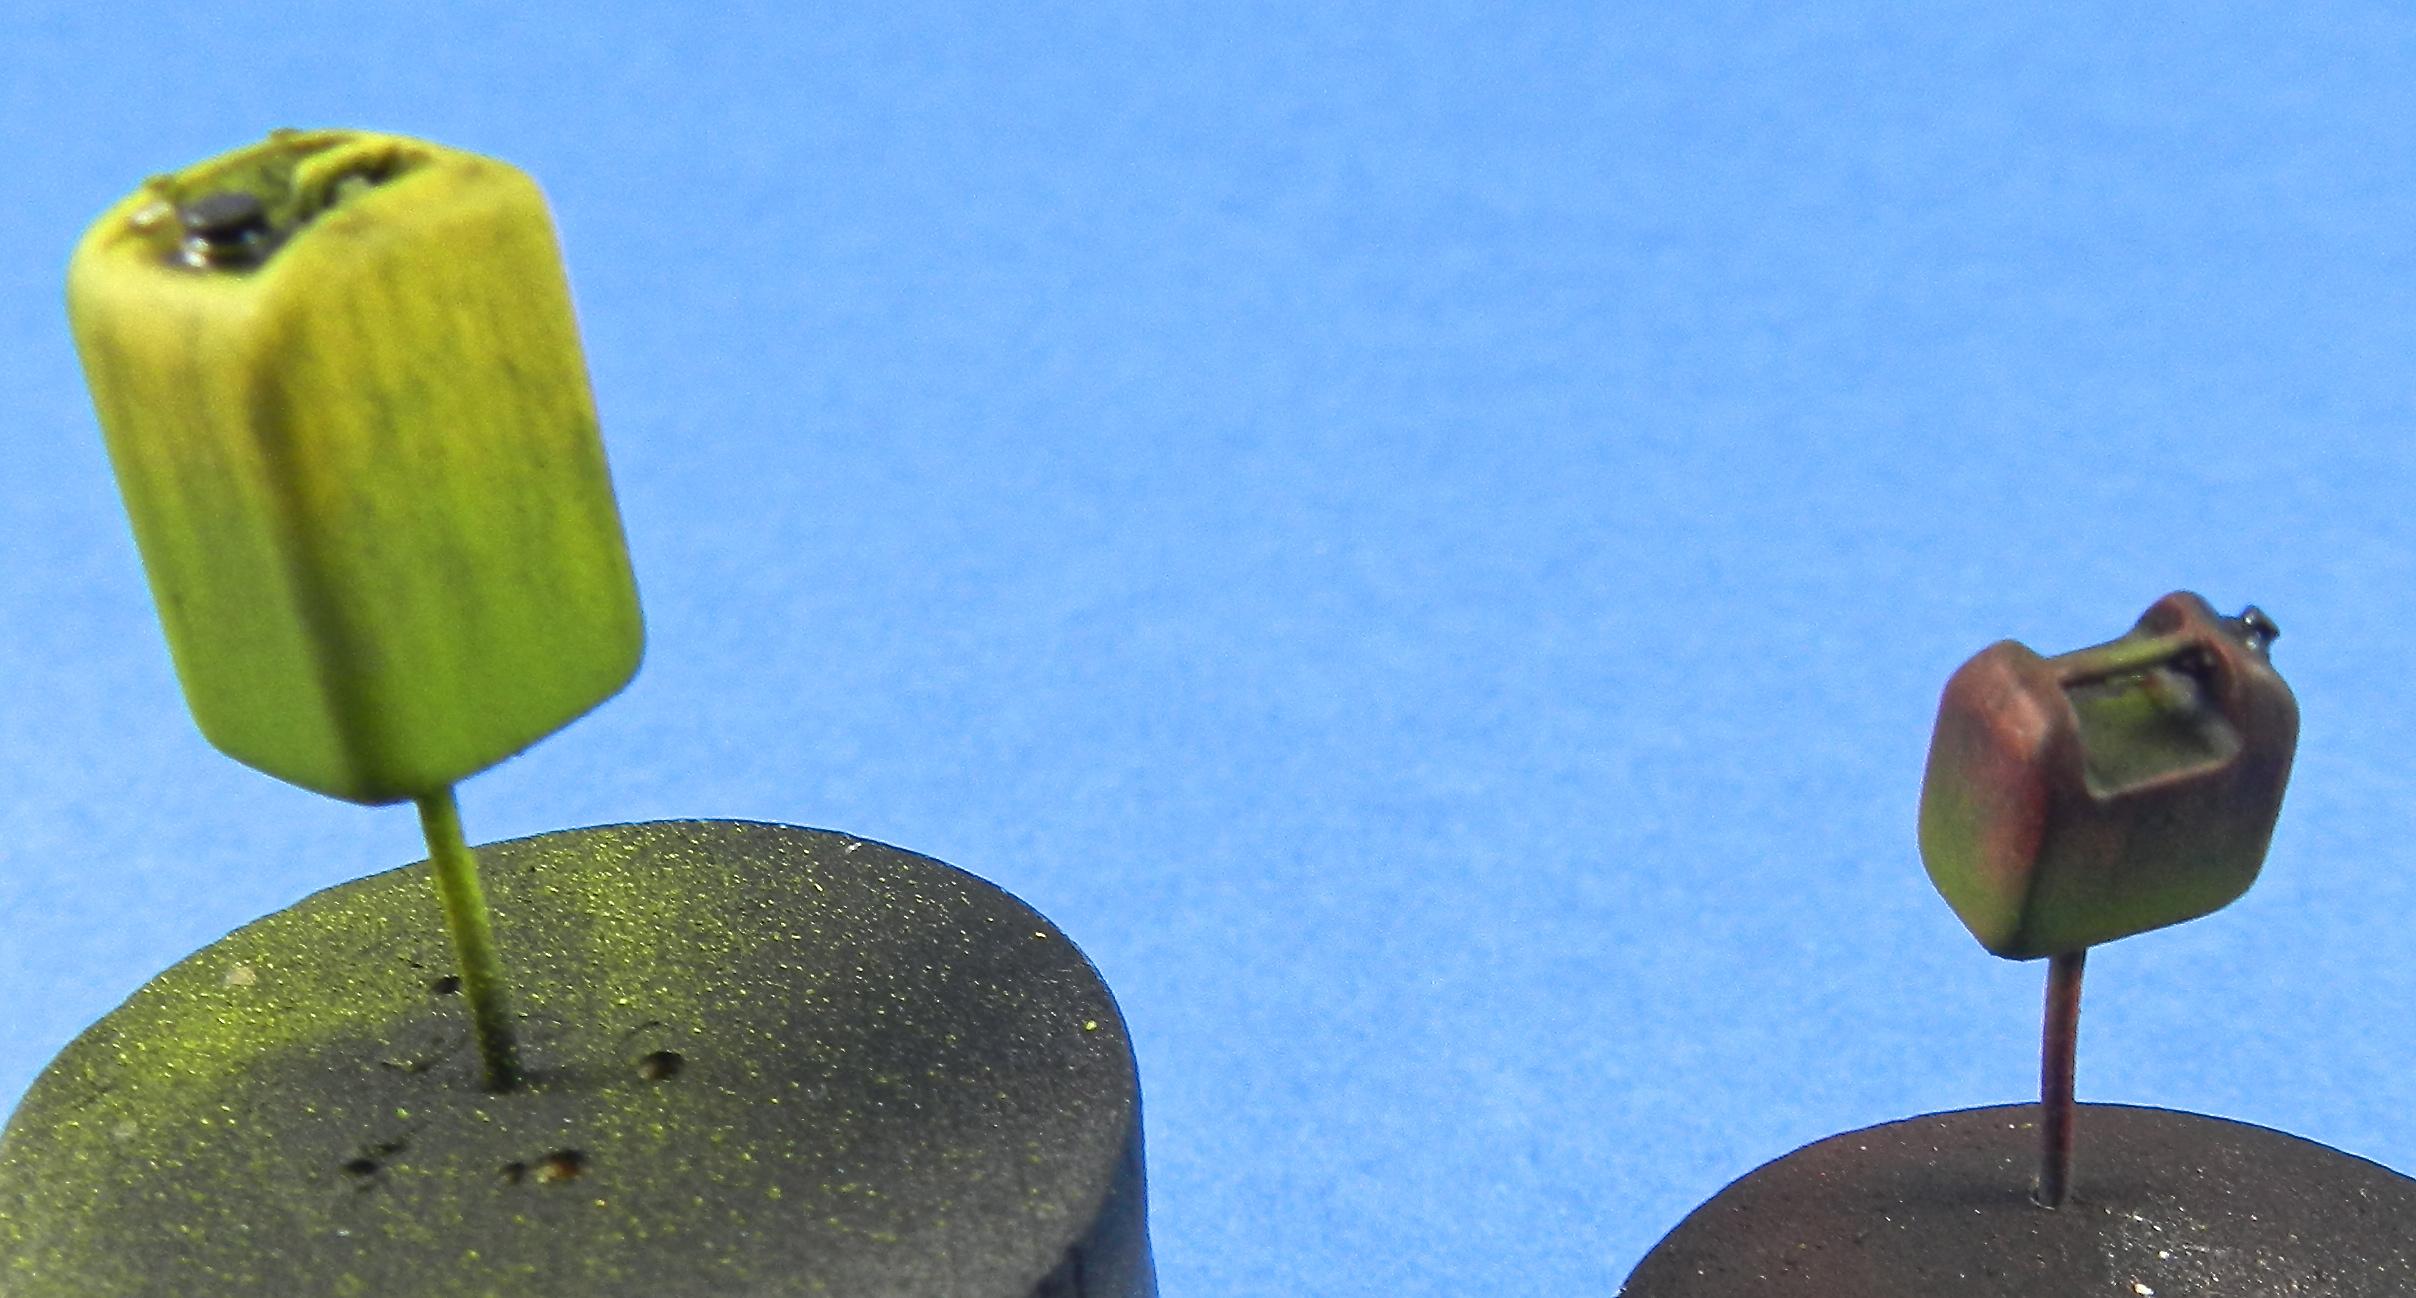 DIORAMA épave de HALFTRACK (1/35 SCRATCH) ( terminé le 10/01/2014) - Page 2 13121605521715063811823102